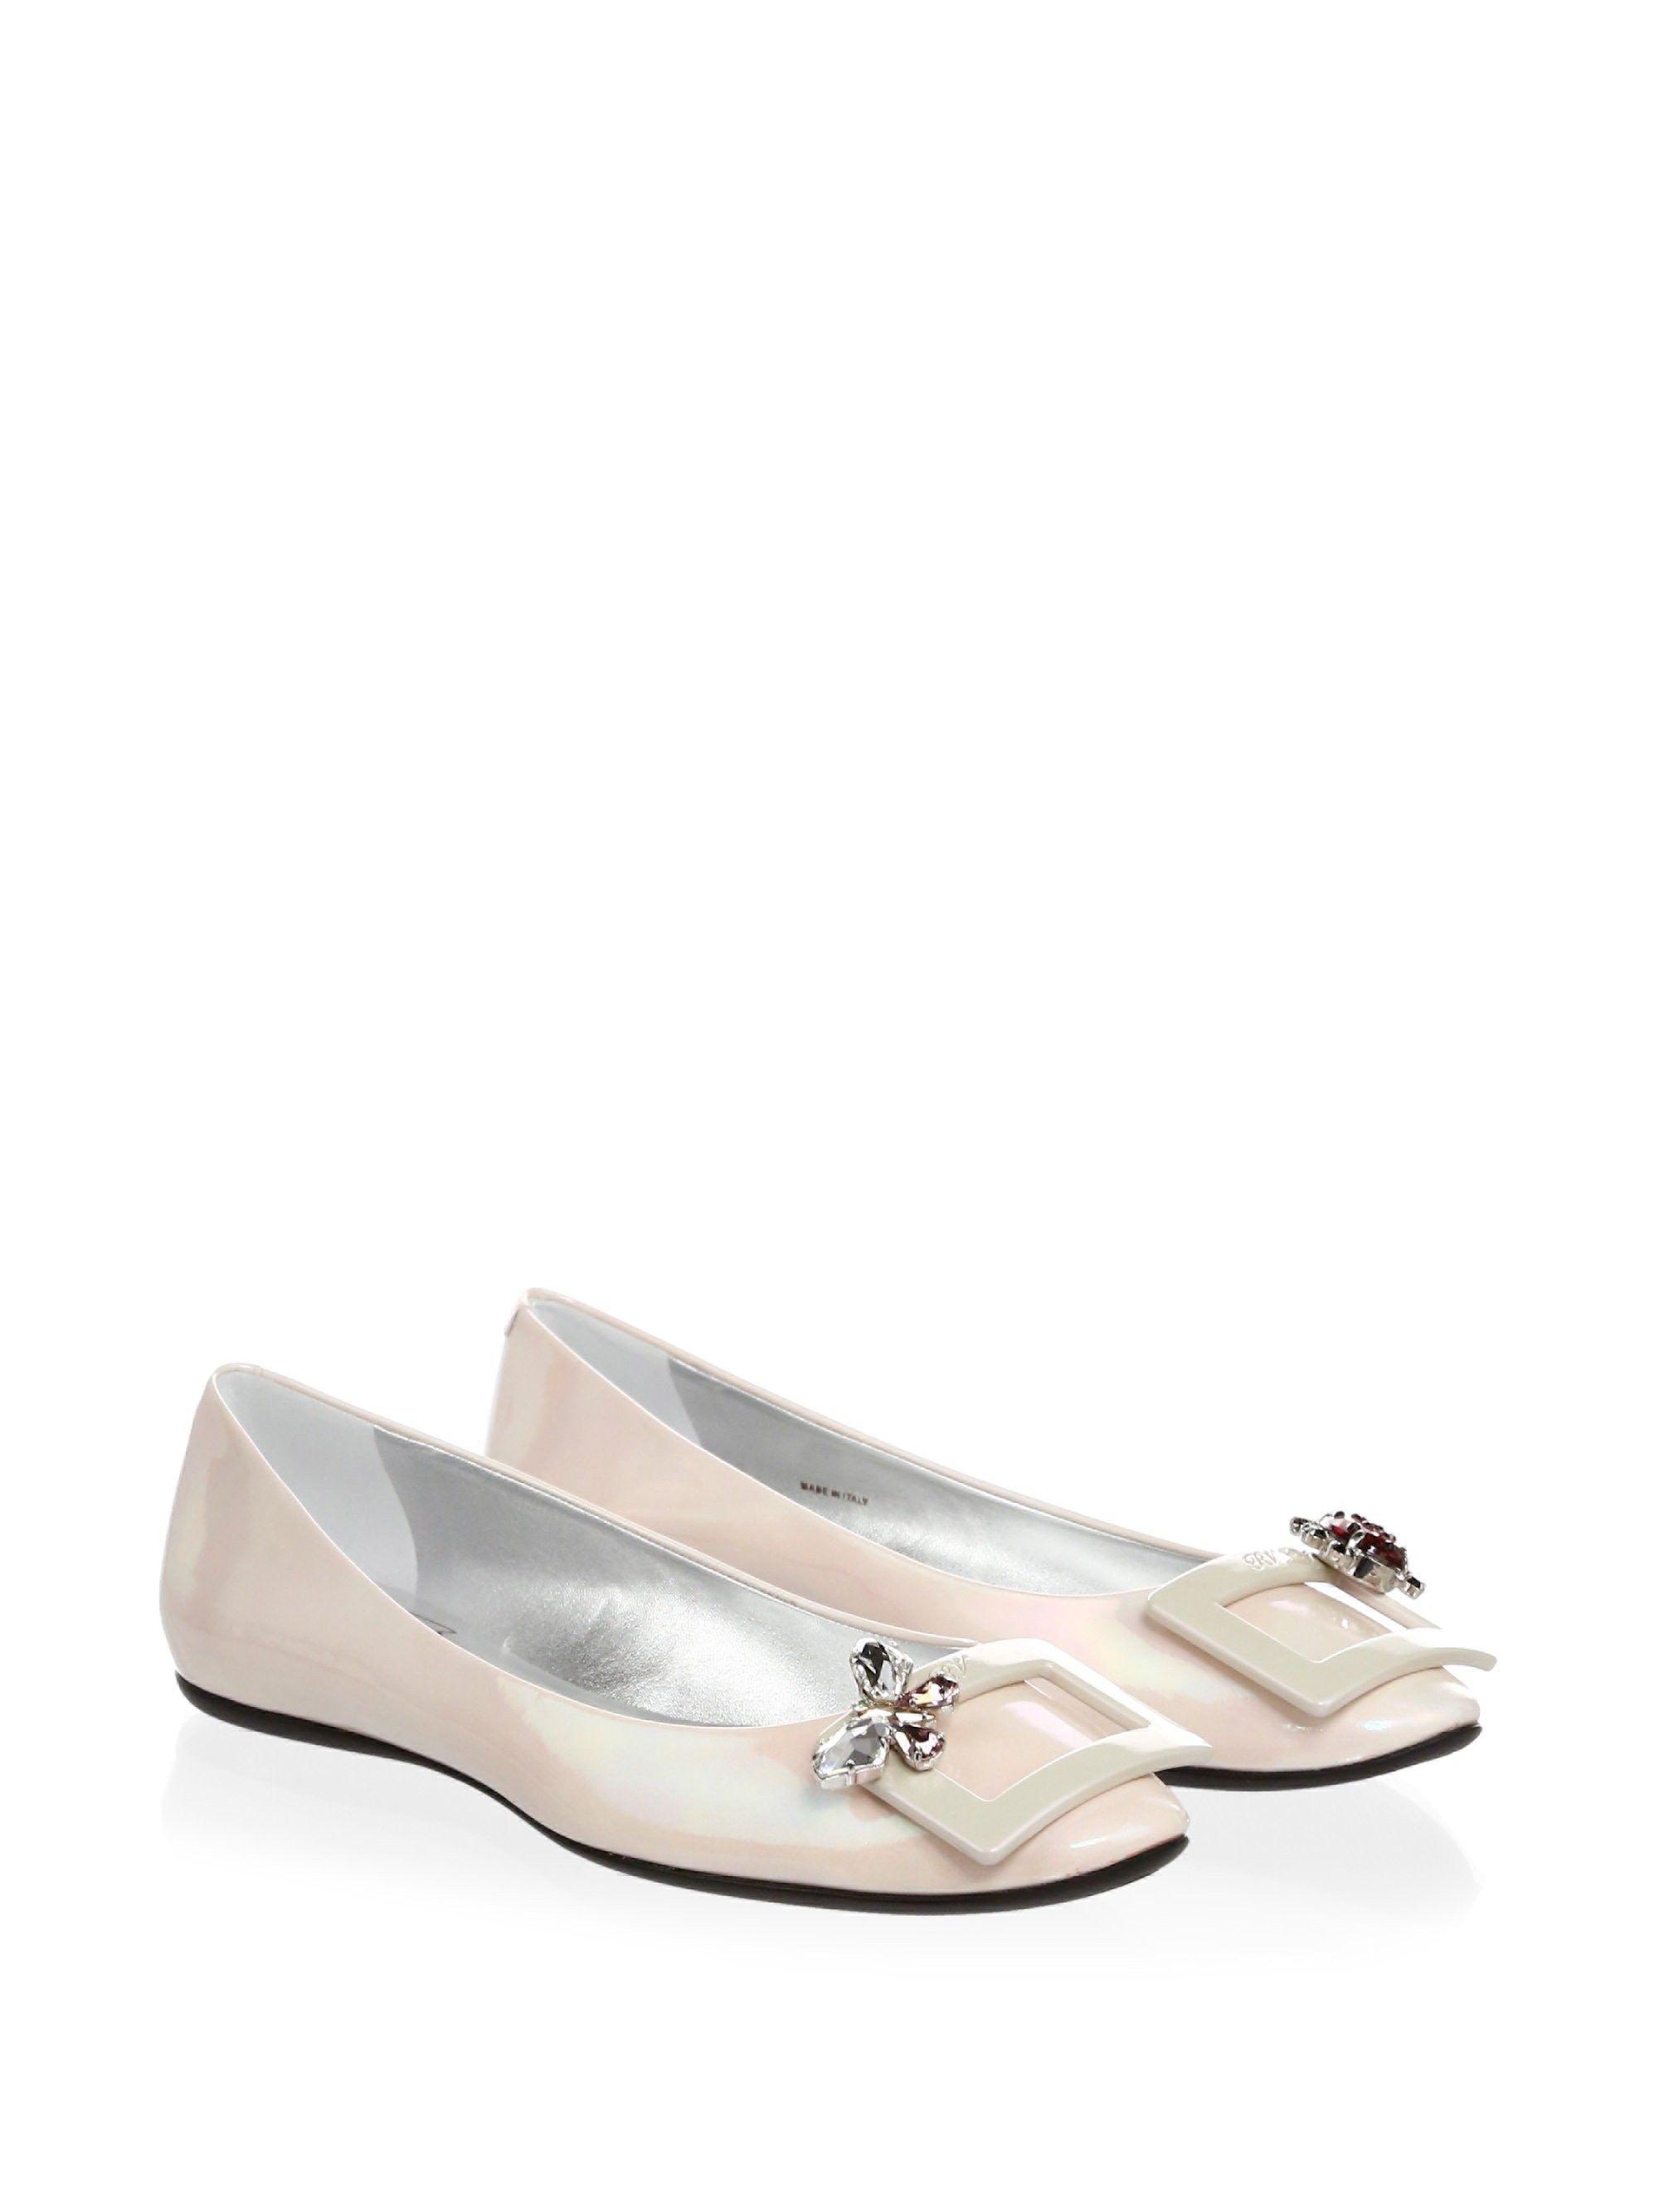 346051e9e18f Roger Vivier Gommette Patent Leather Ballerina Flats - Light Pink 37.5  (7.5)  RogerVivier